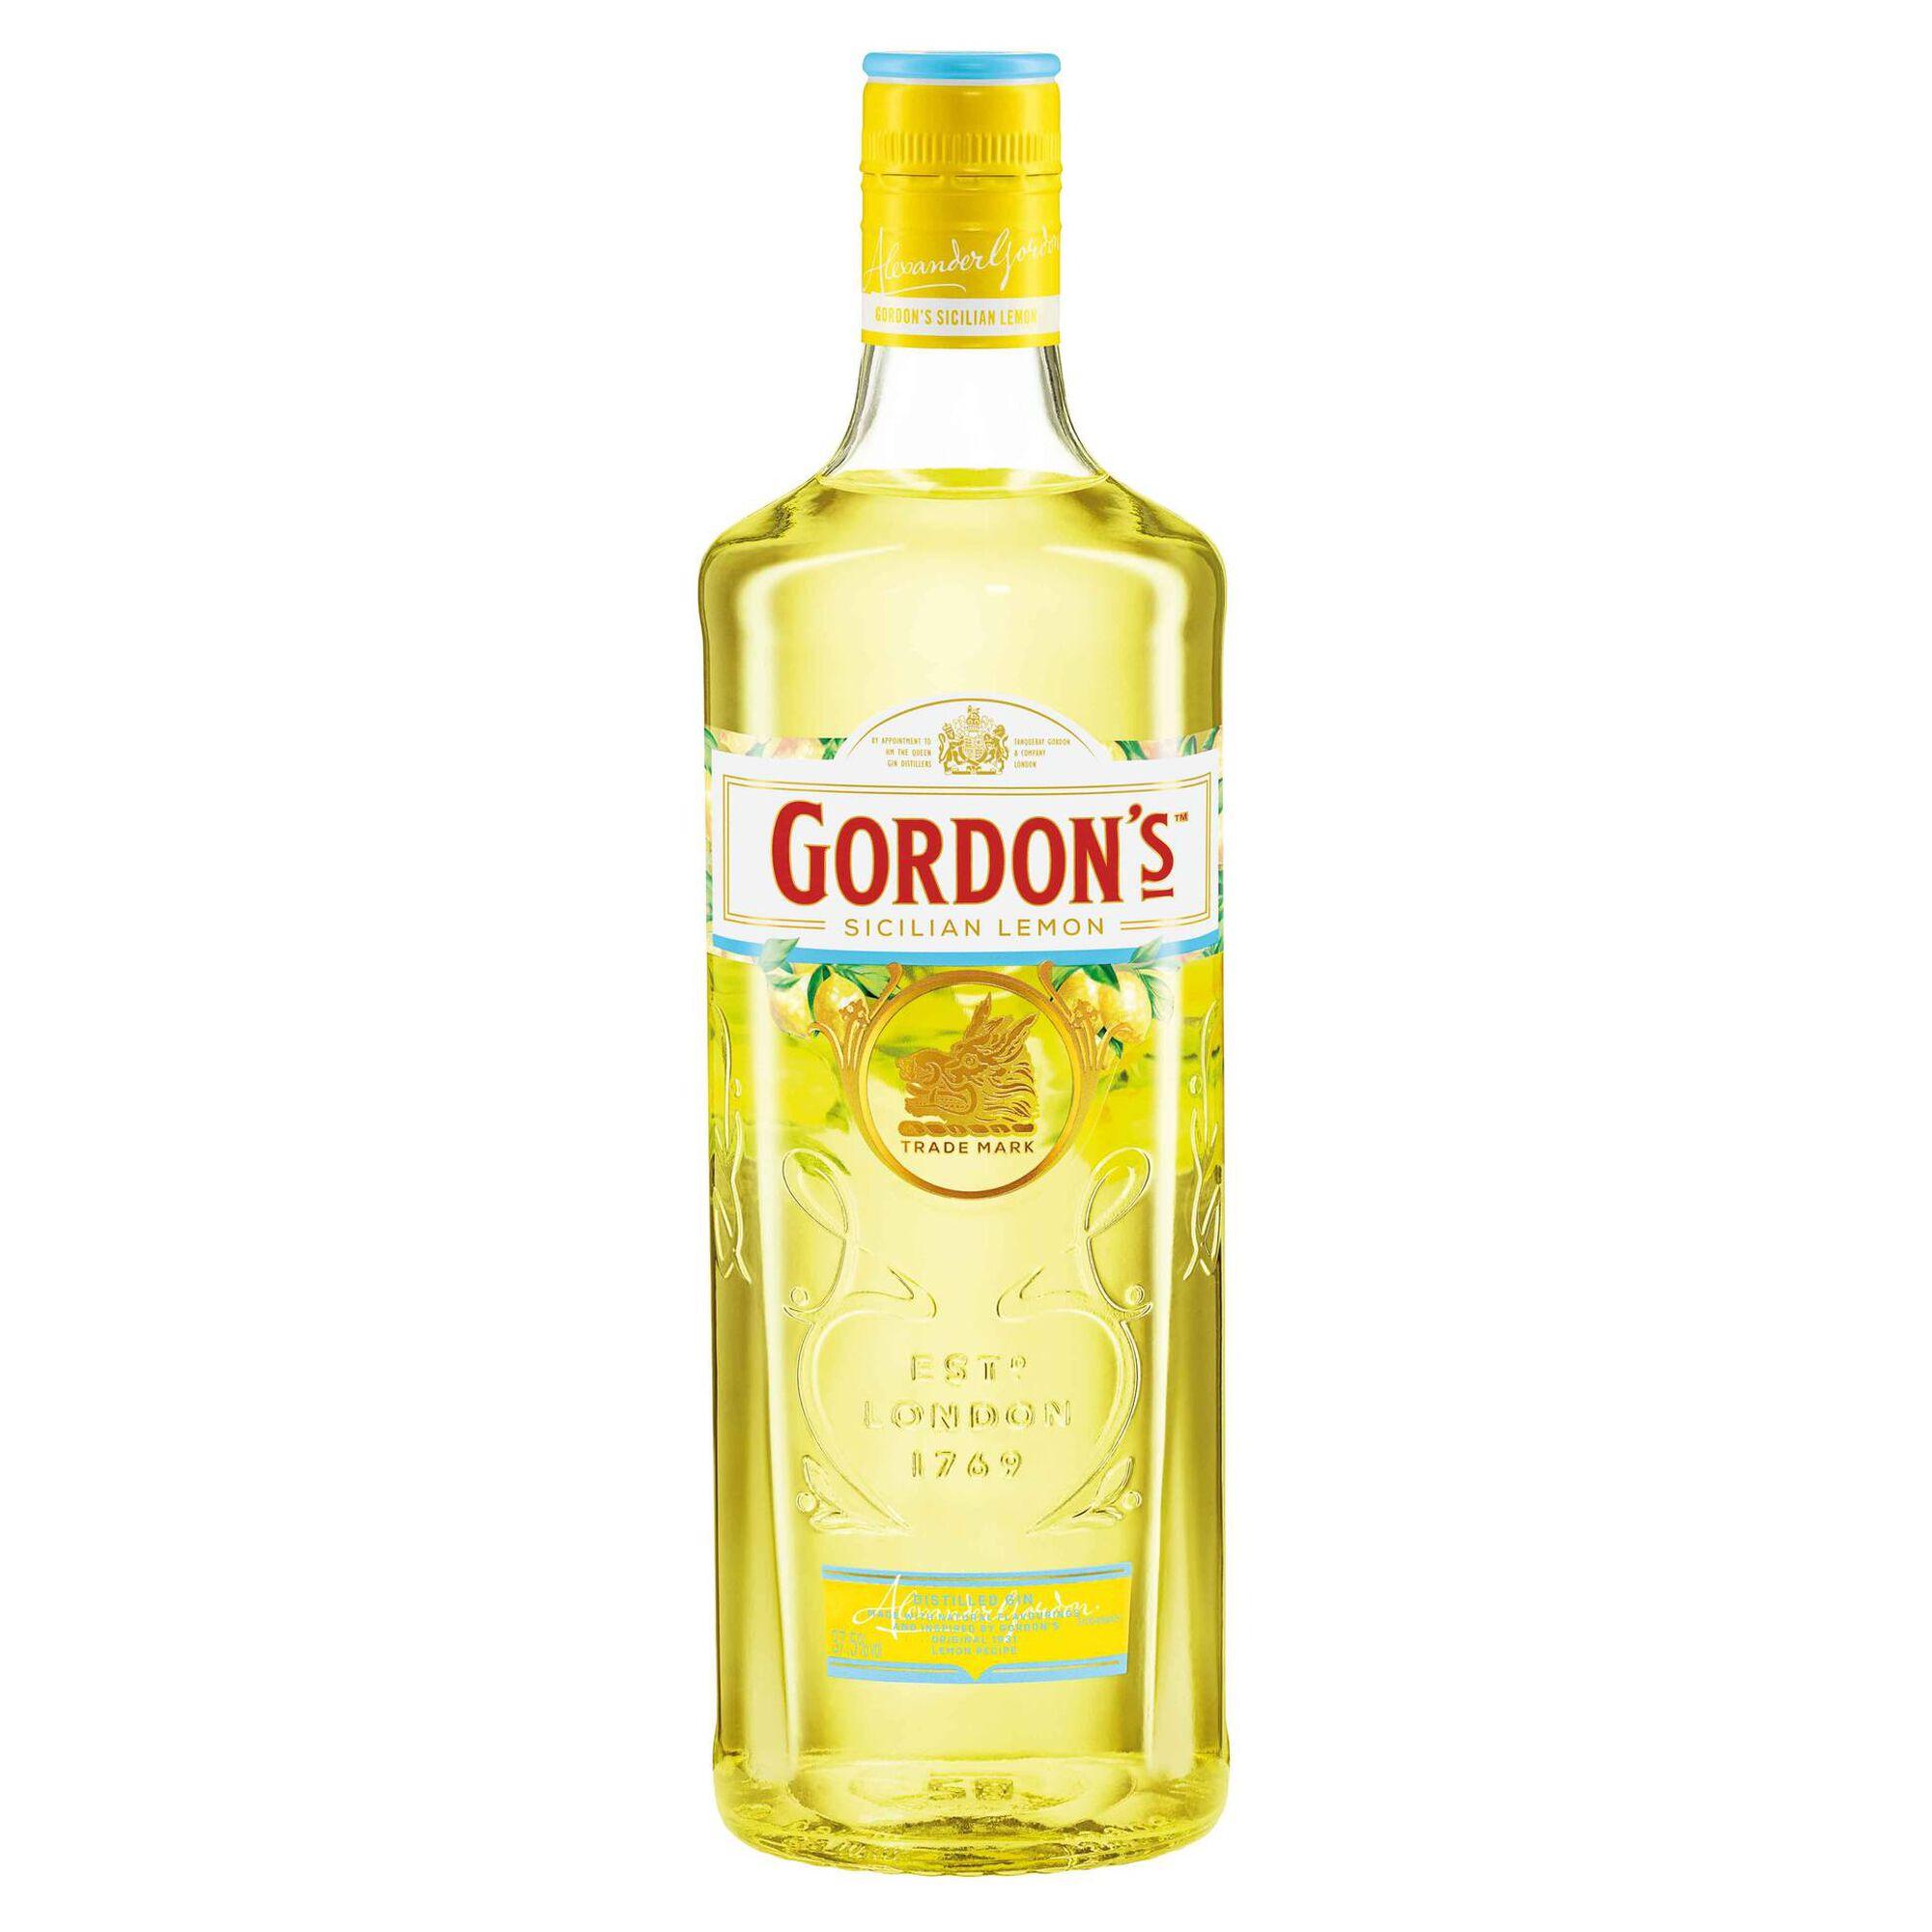 Gin Gordon's Sicilian Lemon